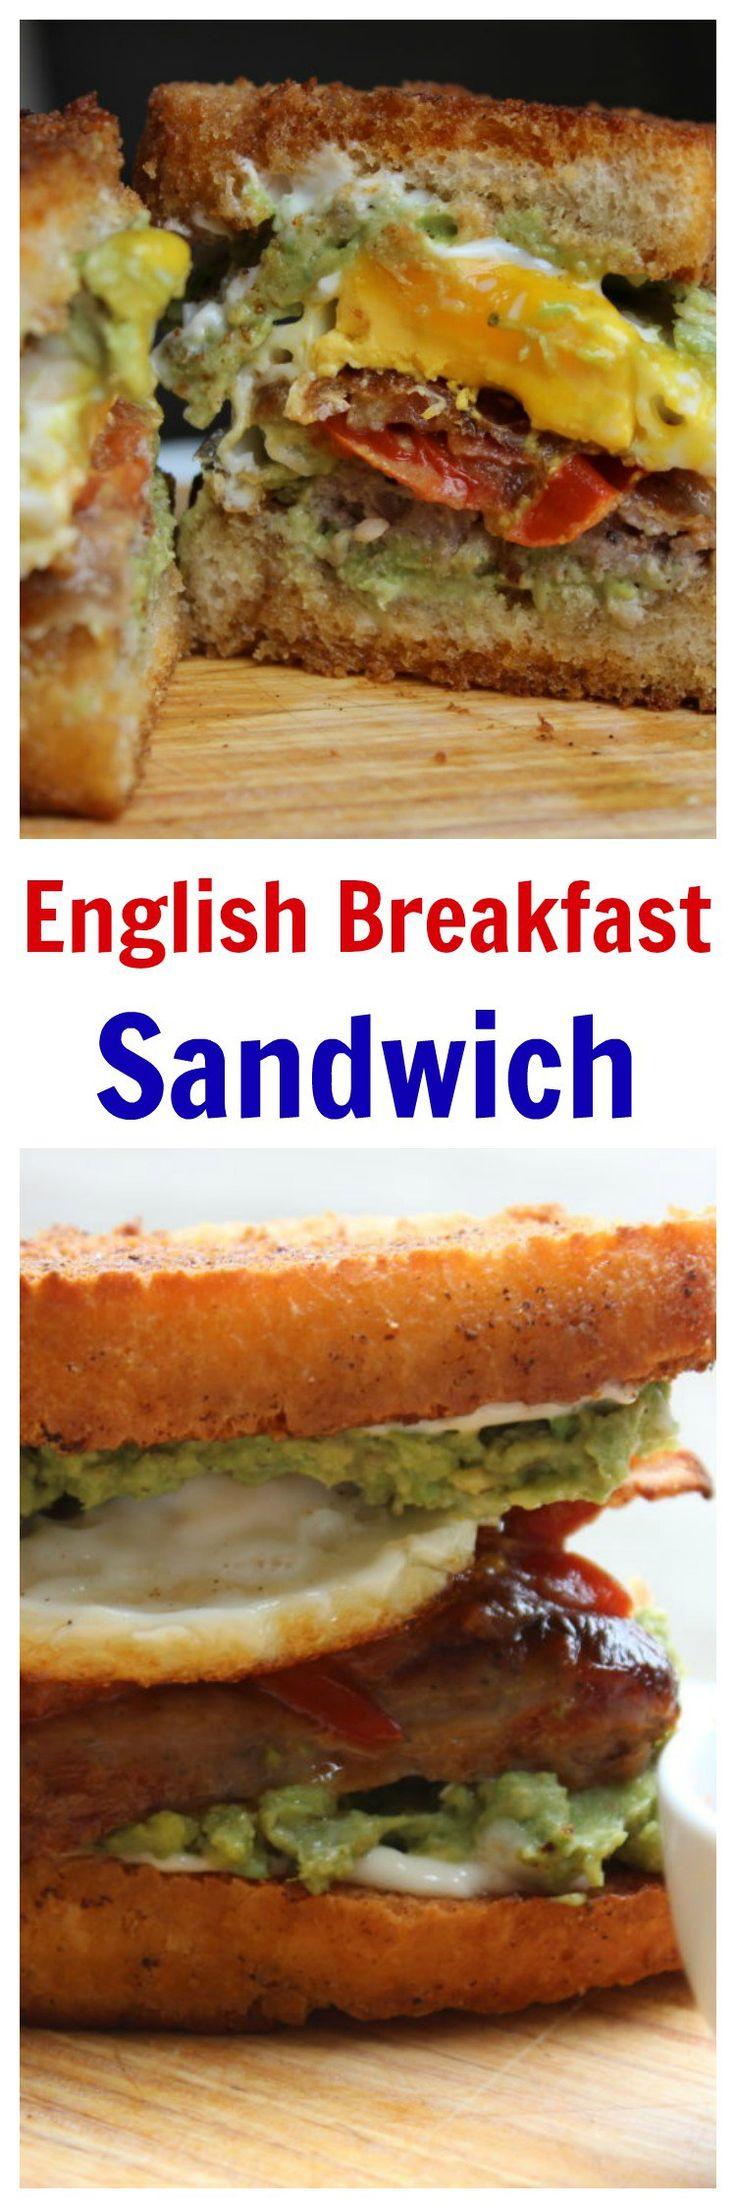 English Breakfast Sandwich. This full English breakfast in a sandwich ...